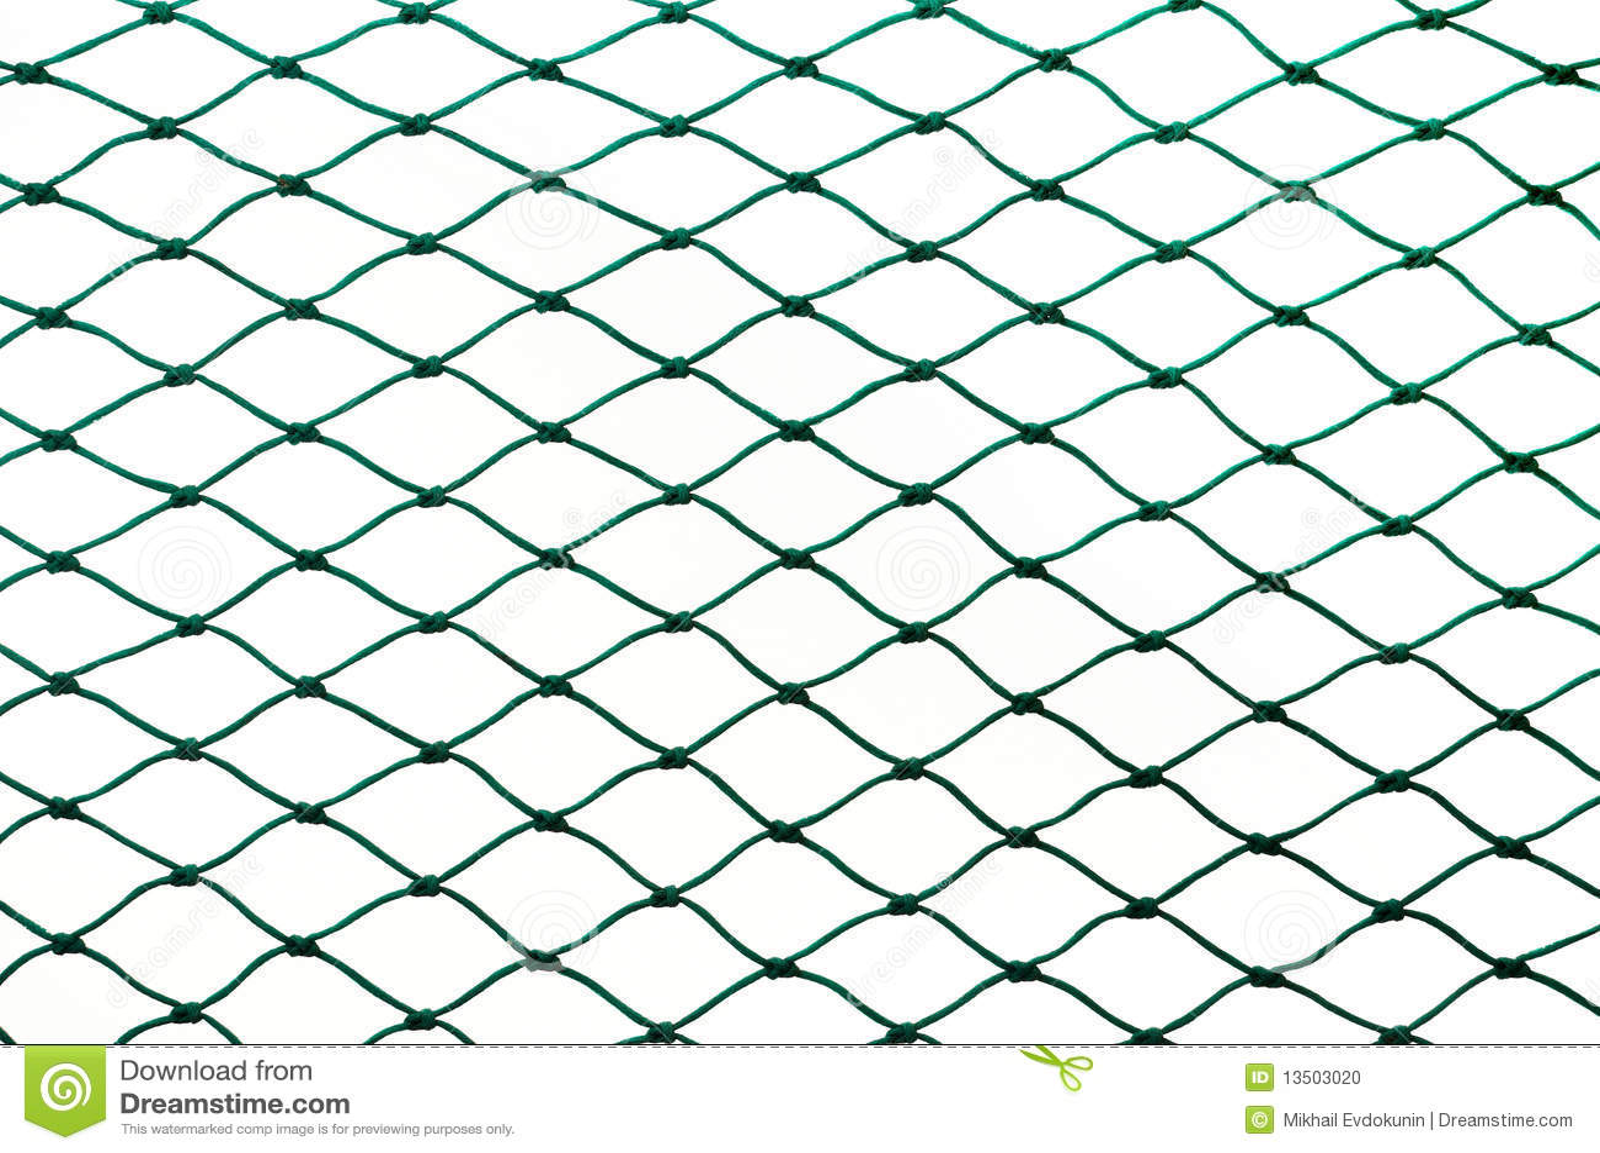 Fishing Net Stock Photo  Image 13503020